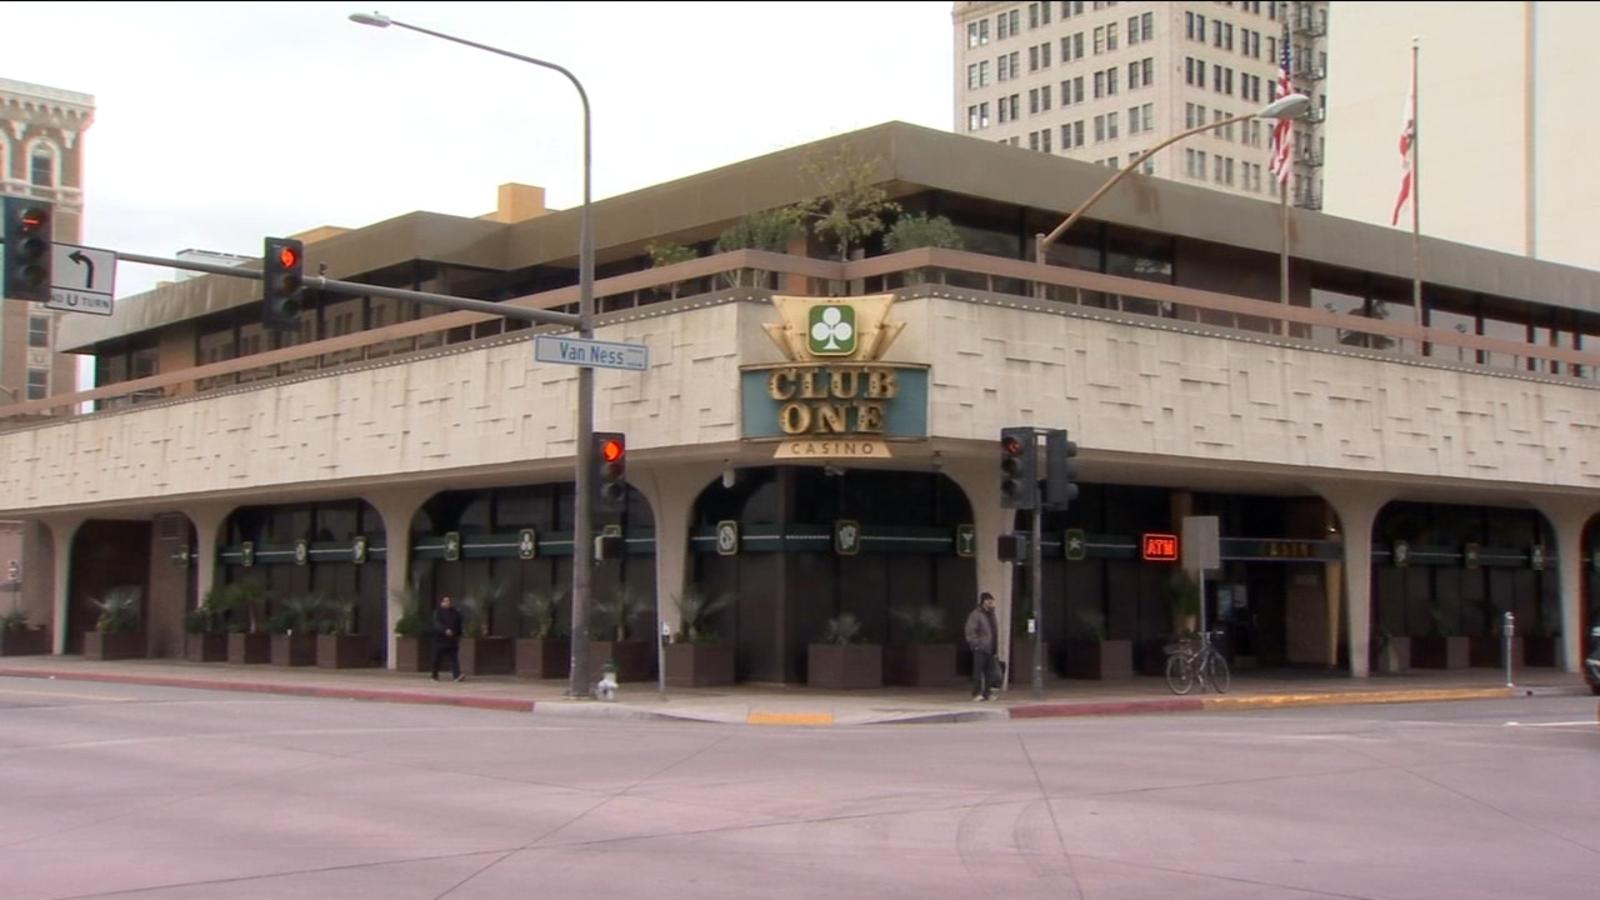 Club One Casino